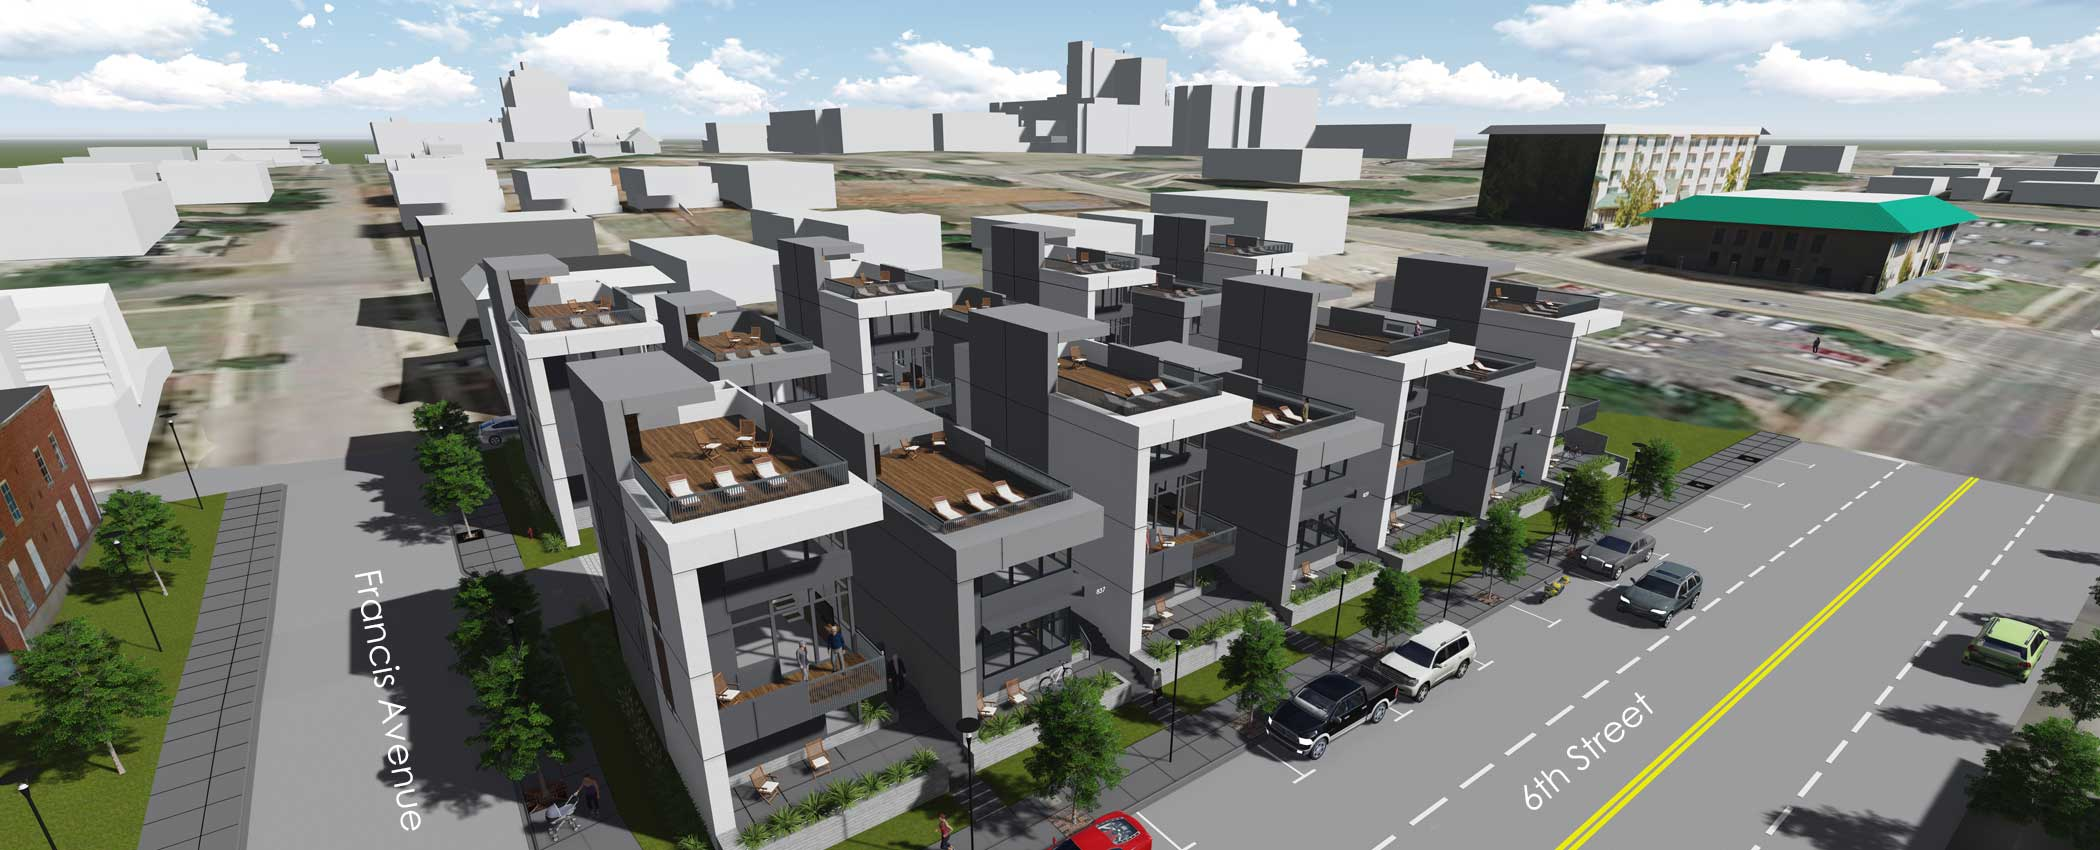 7-Dwellings-SoSA.jpg